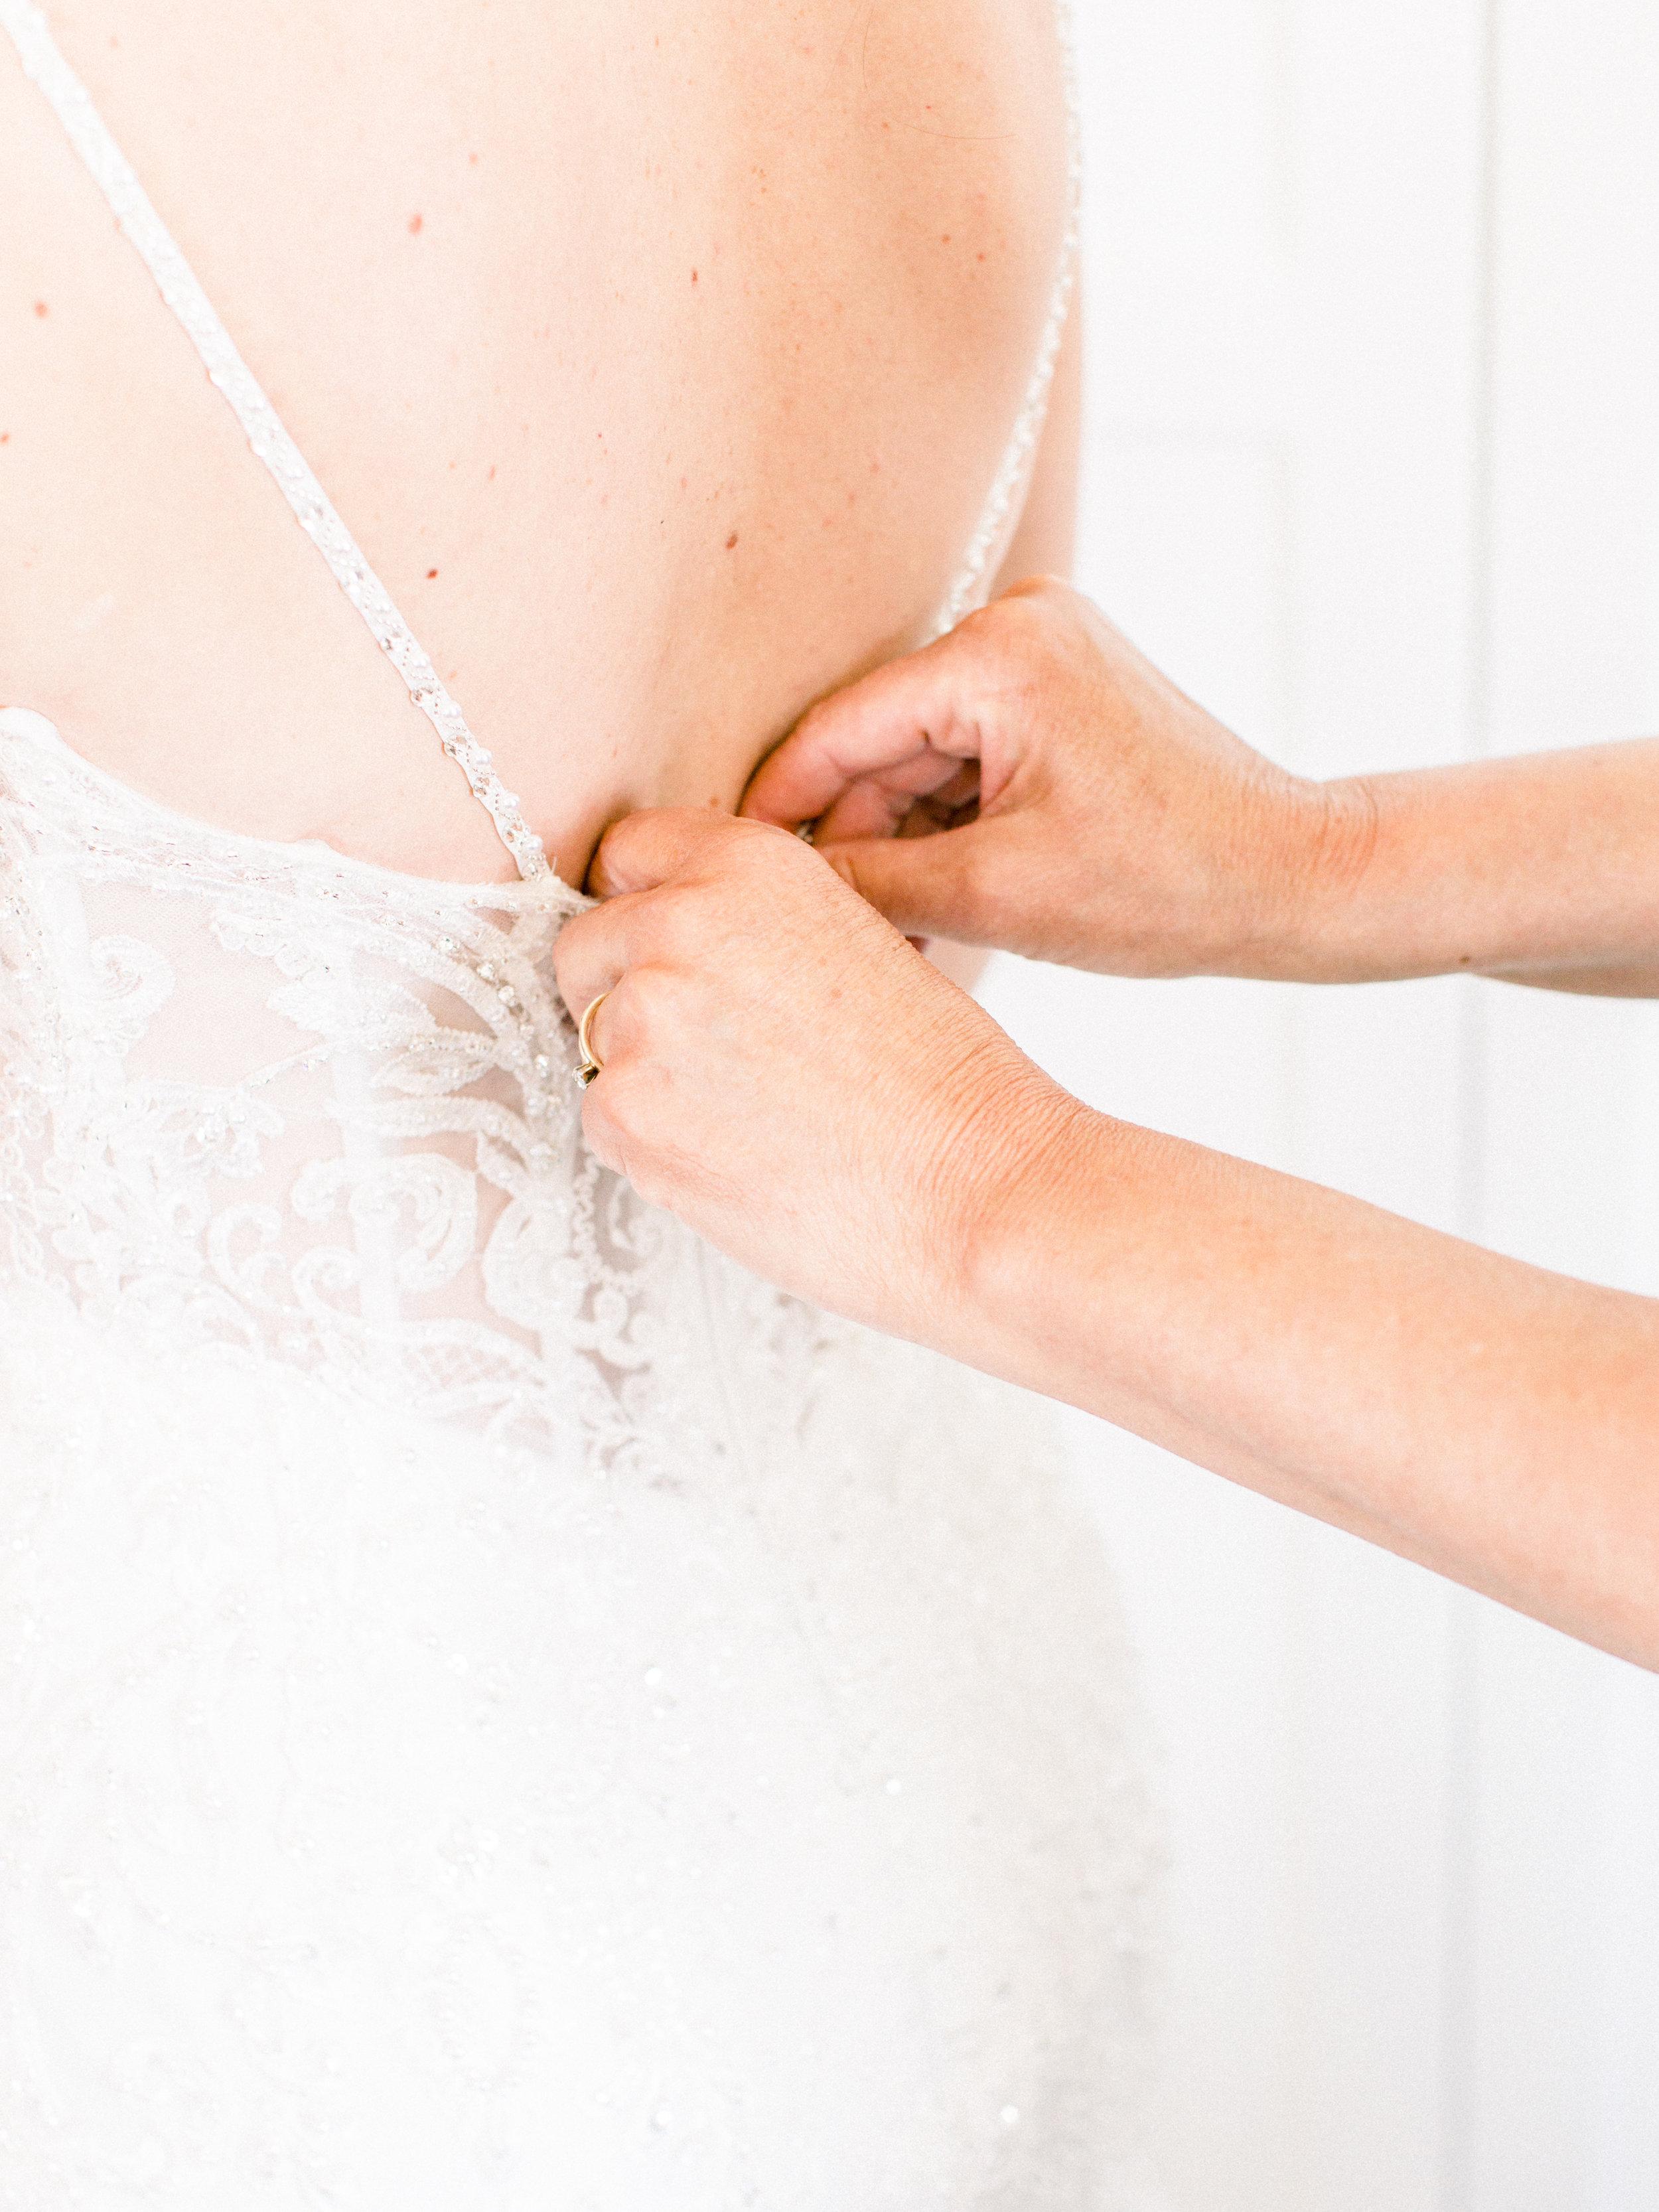 Noss+Wedding+Getting+Ready-118.jpg